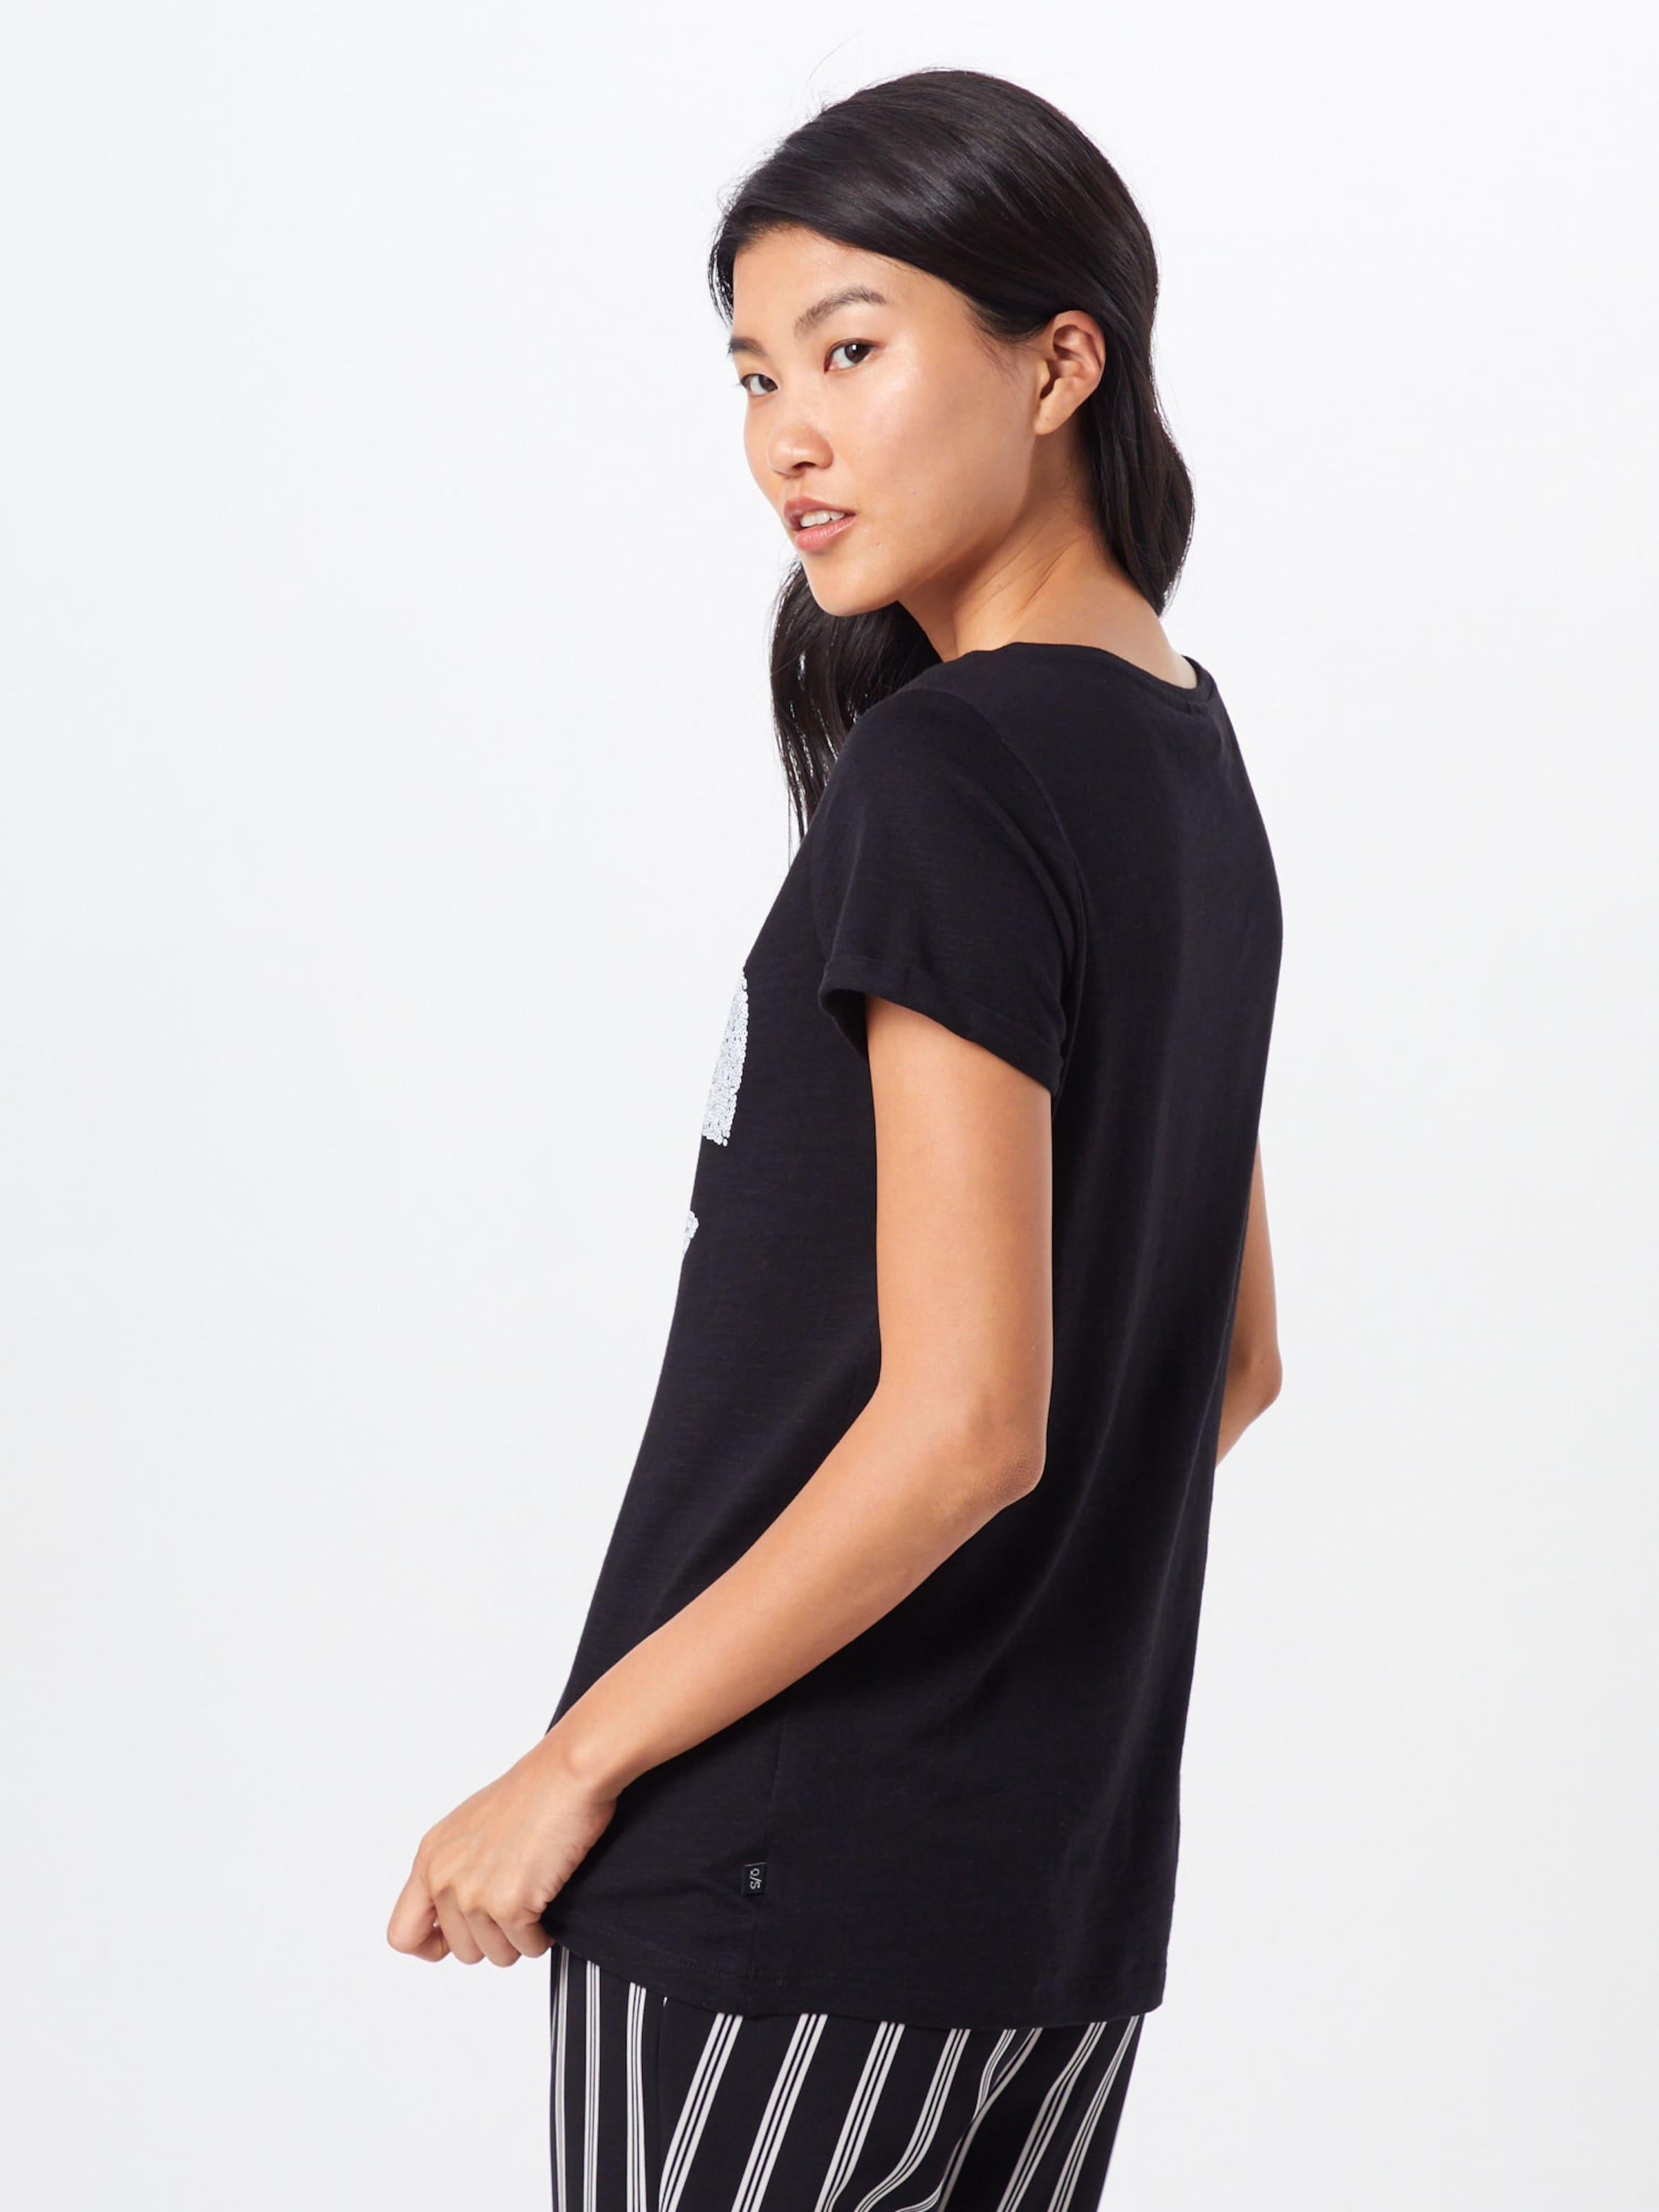 Q Designed shirt T s NoirBlanc By En SjMGLqUzVp